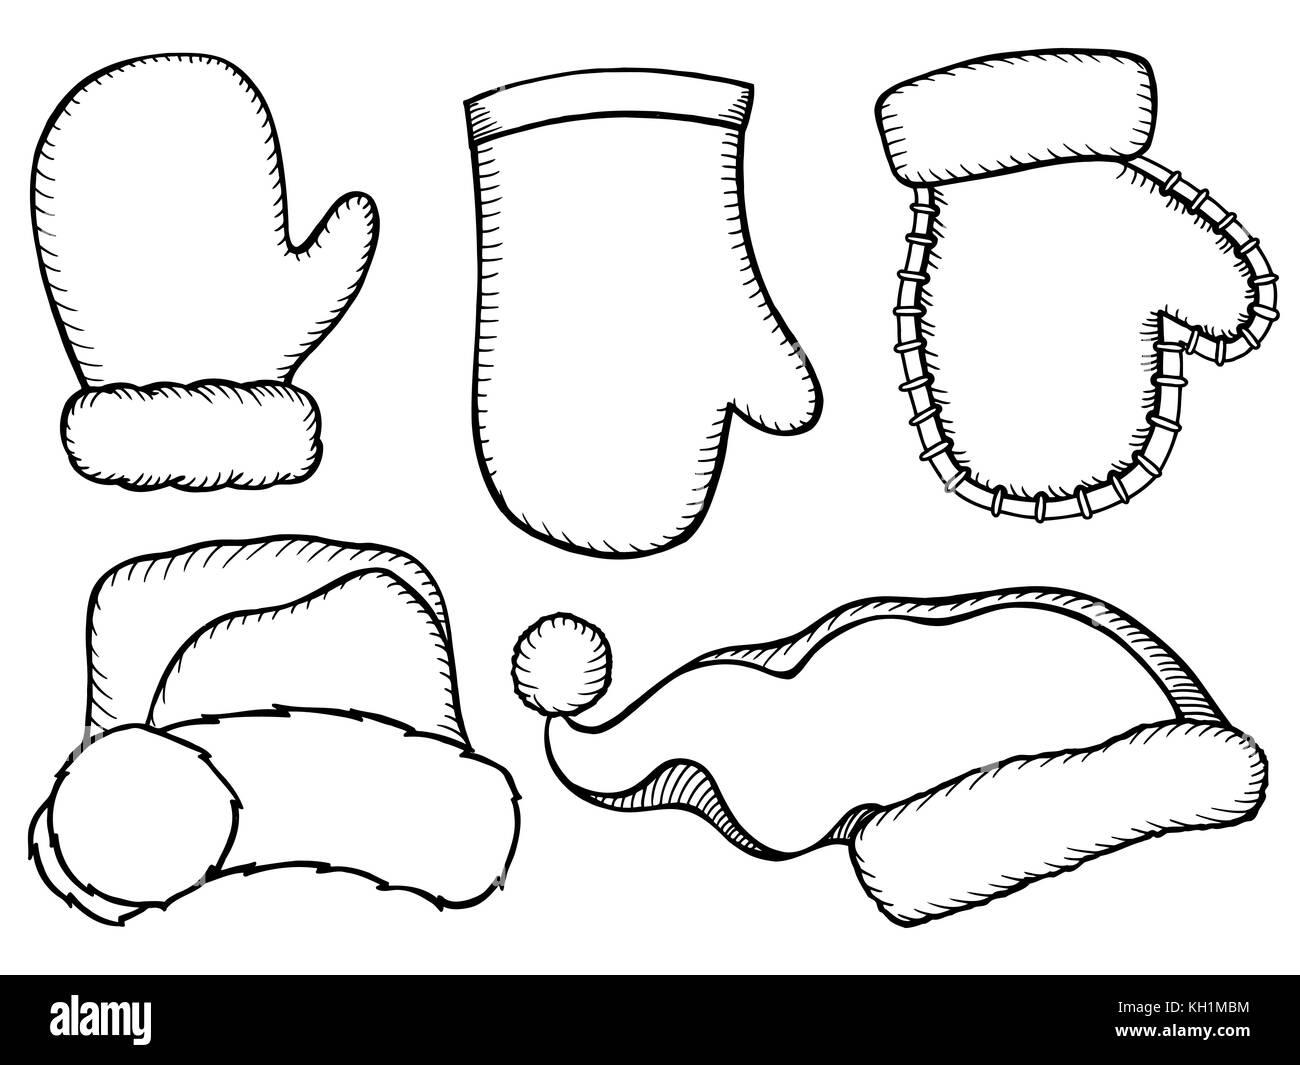 santa claus template image collections template design ideas. Black Bedroom Furniture Sets. Home Design Ideas